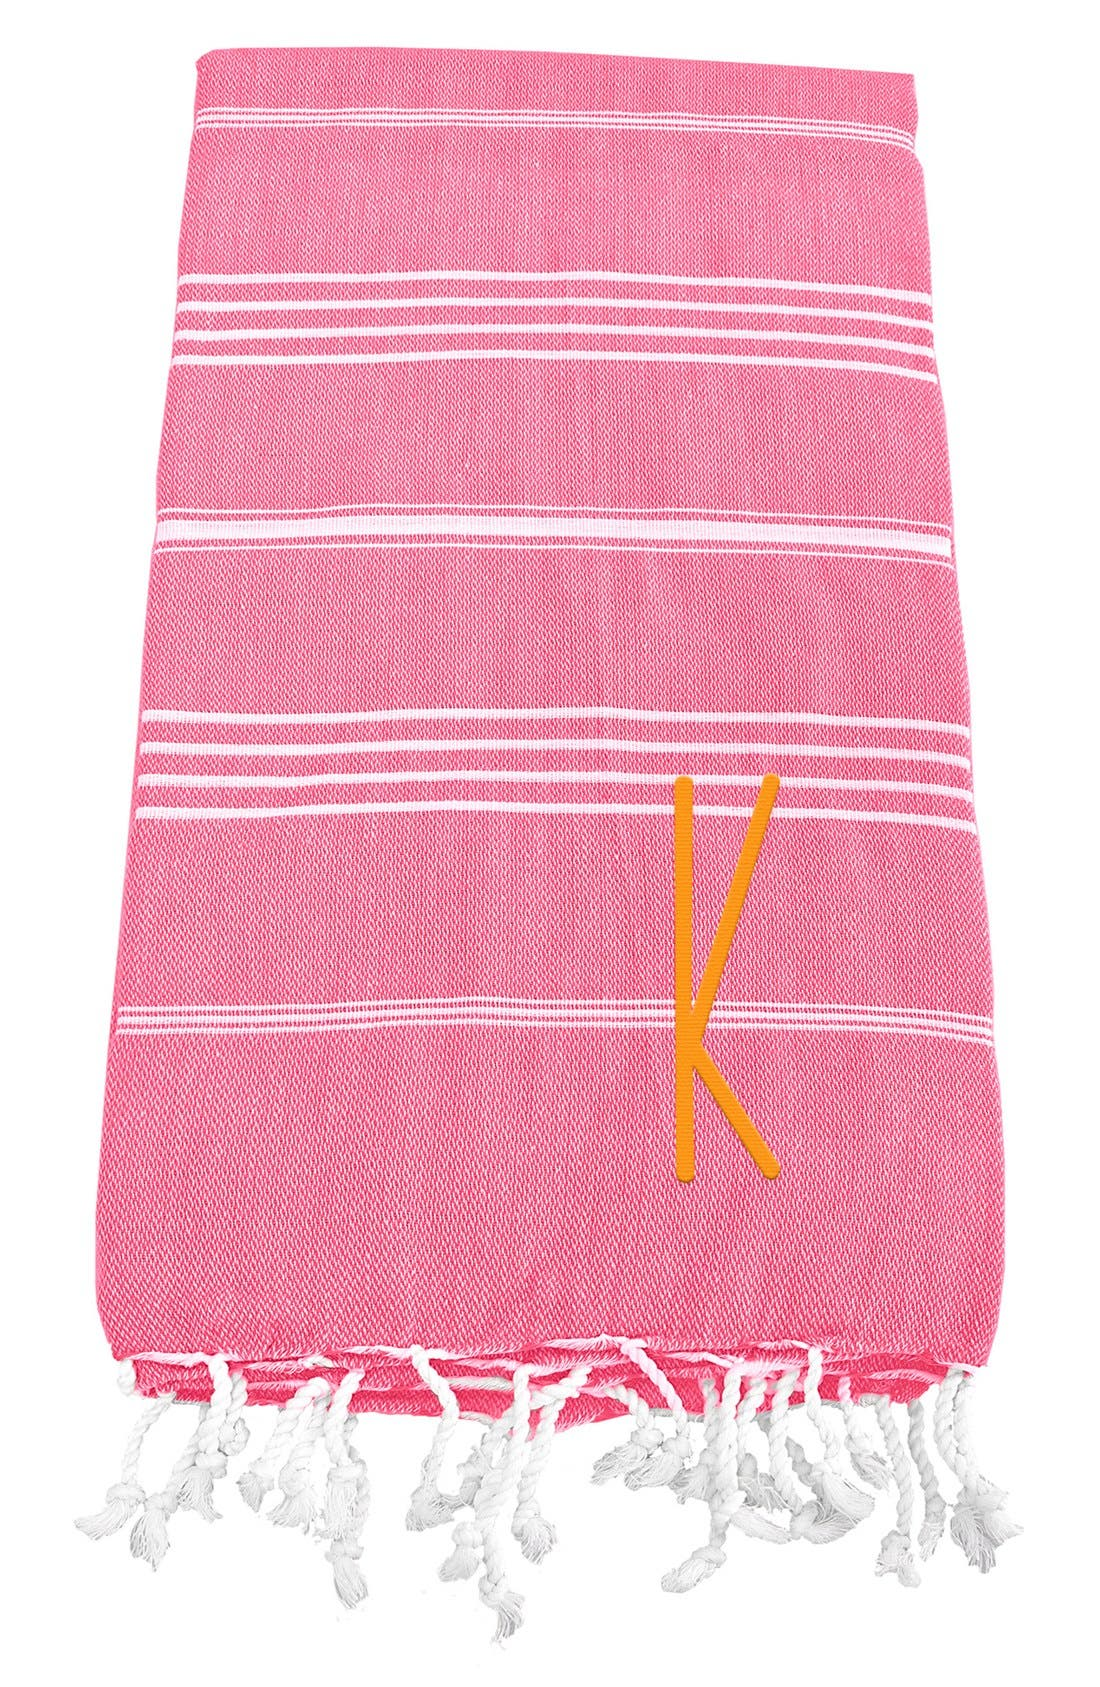 Monogram Turkish Cotton Towel,                             Main thumbnail 147, color,